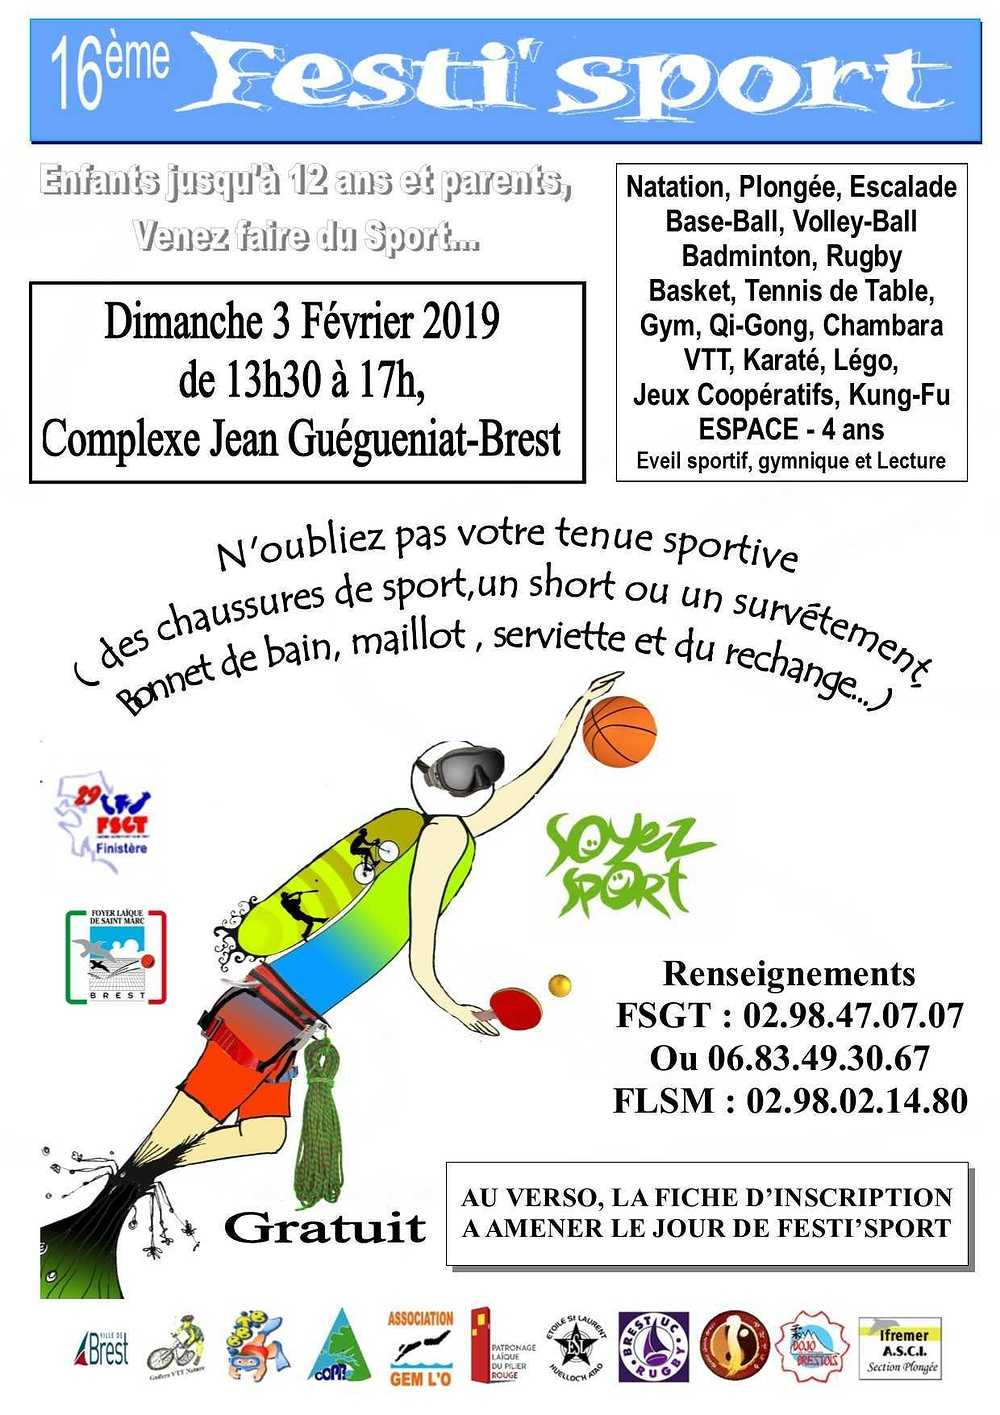 Dimanche 3 février 2019 : flyerrectofestisport2019